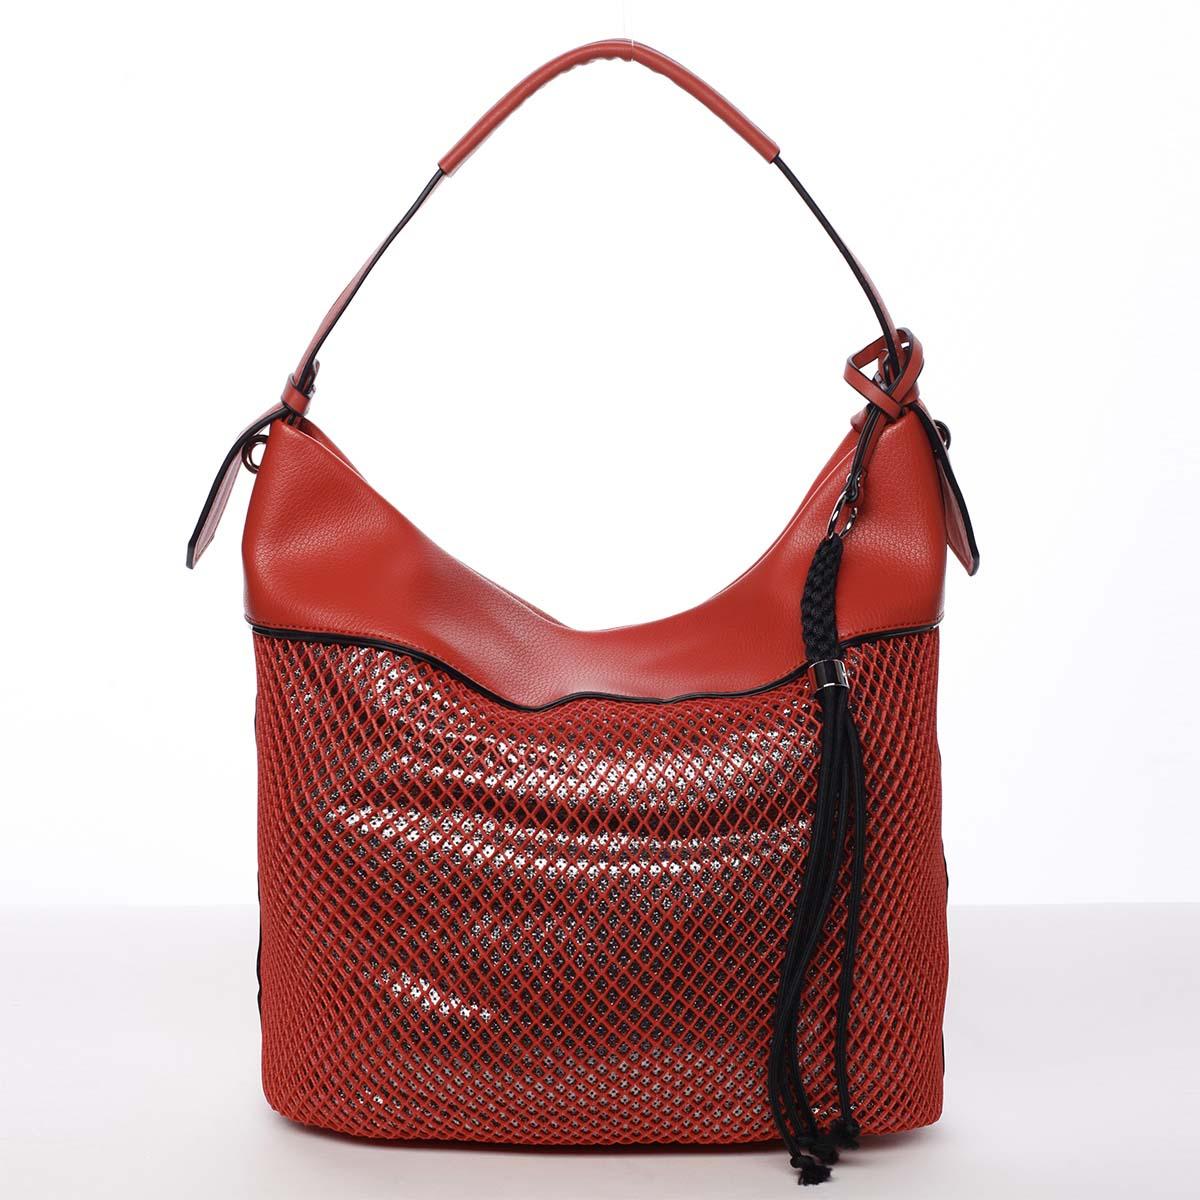 Velká perforovaná dámská kabelka přes rameno červená - Maria C Saghari